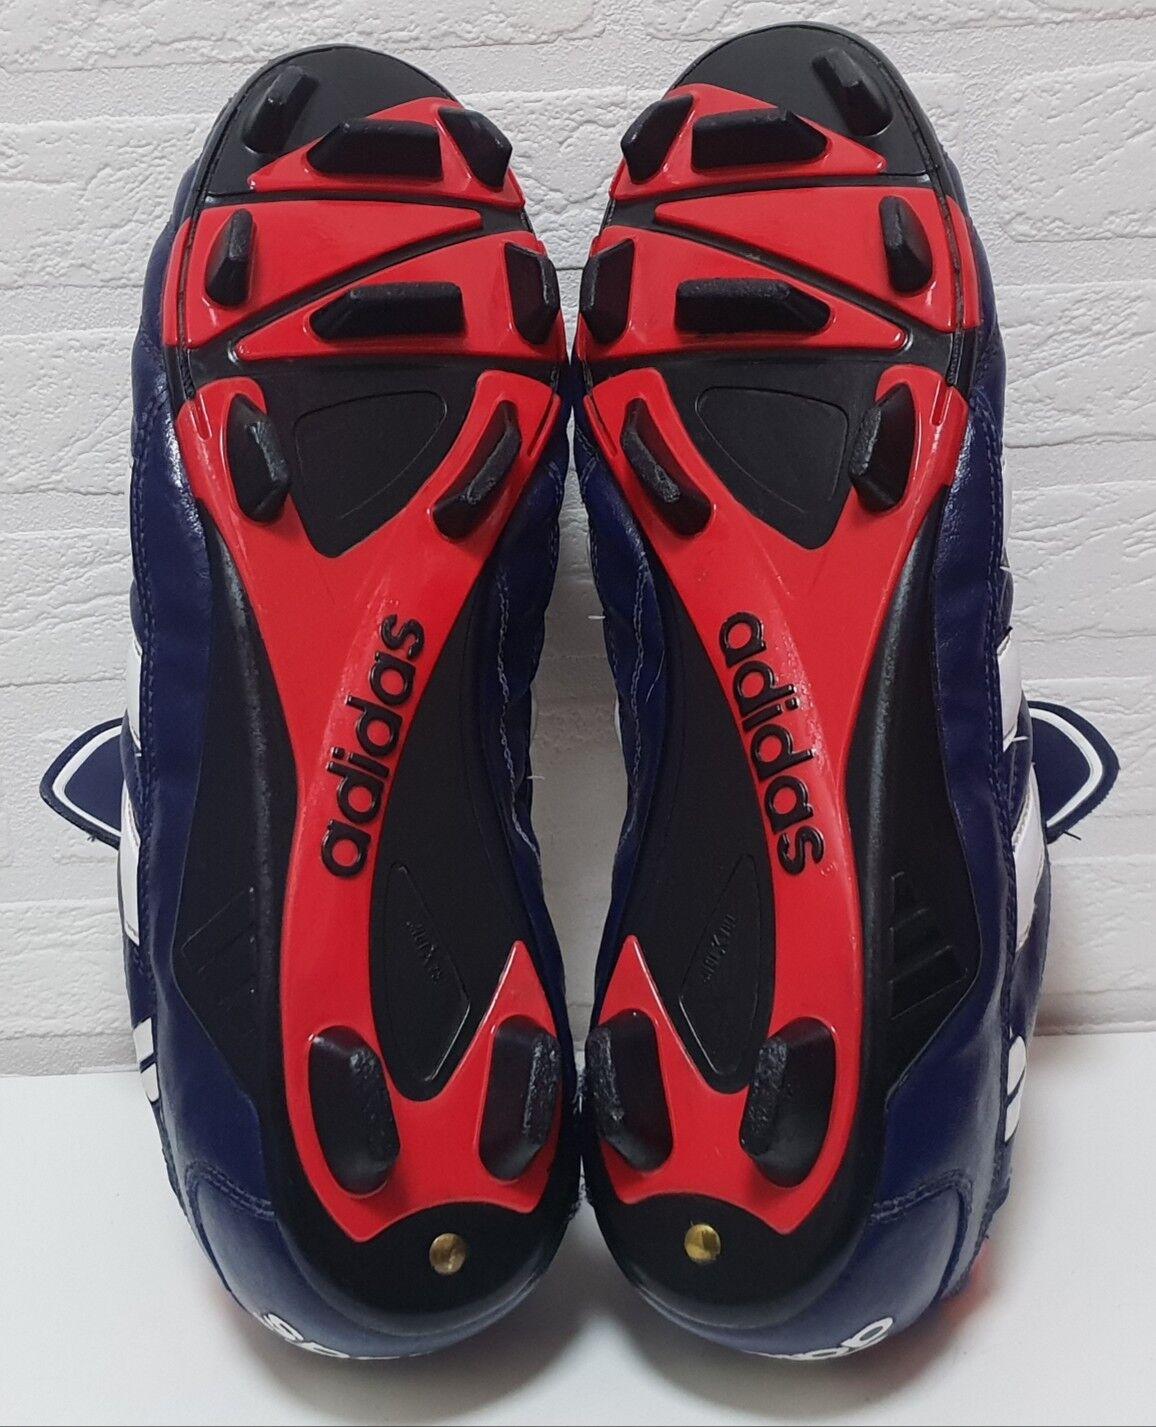 Adidas Adidas Adidas Protator Mania japan Blau Questra 47 1 3  47 5 ; US 12 5 UK 12 WM´02 6bcdbd